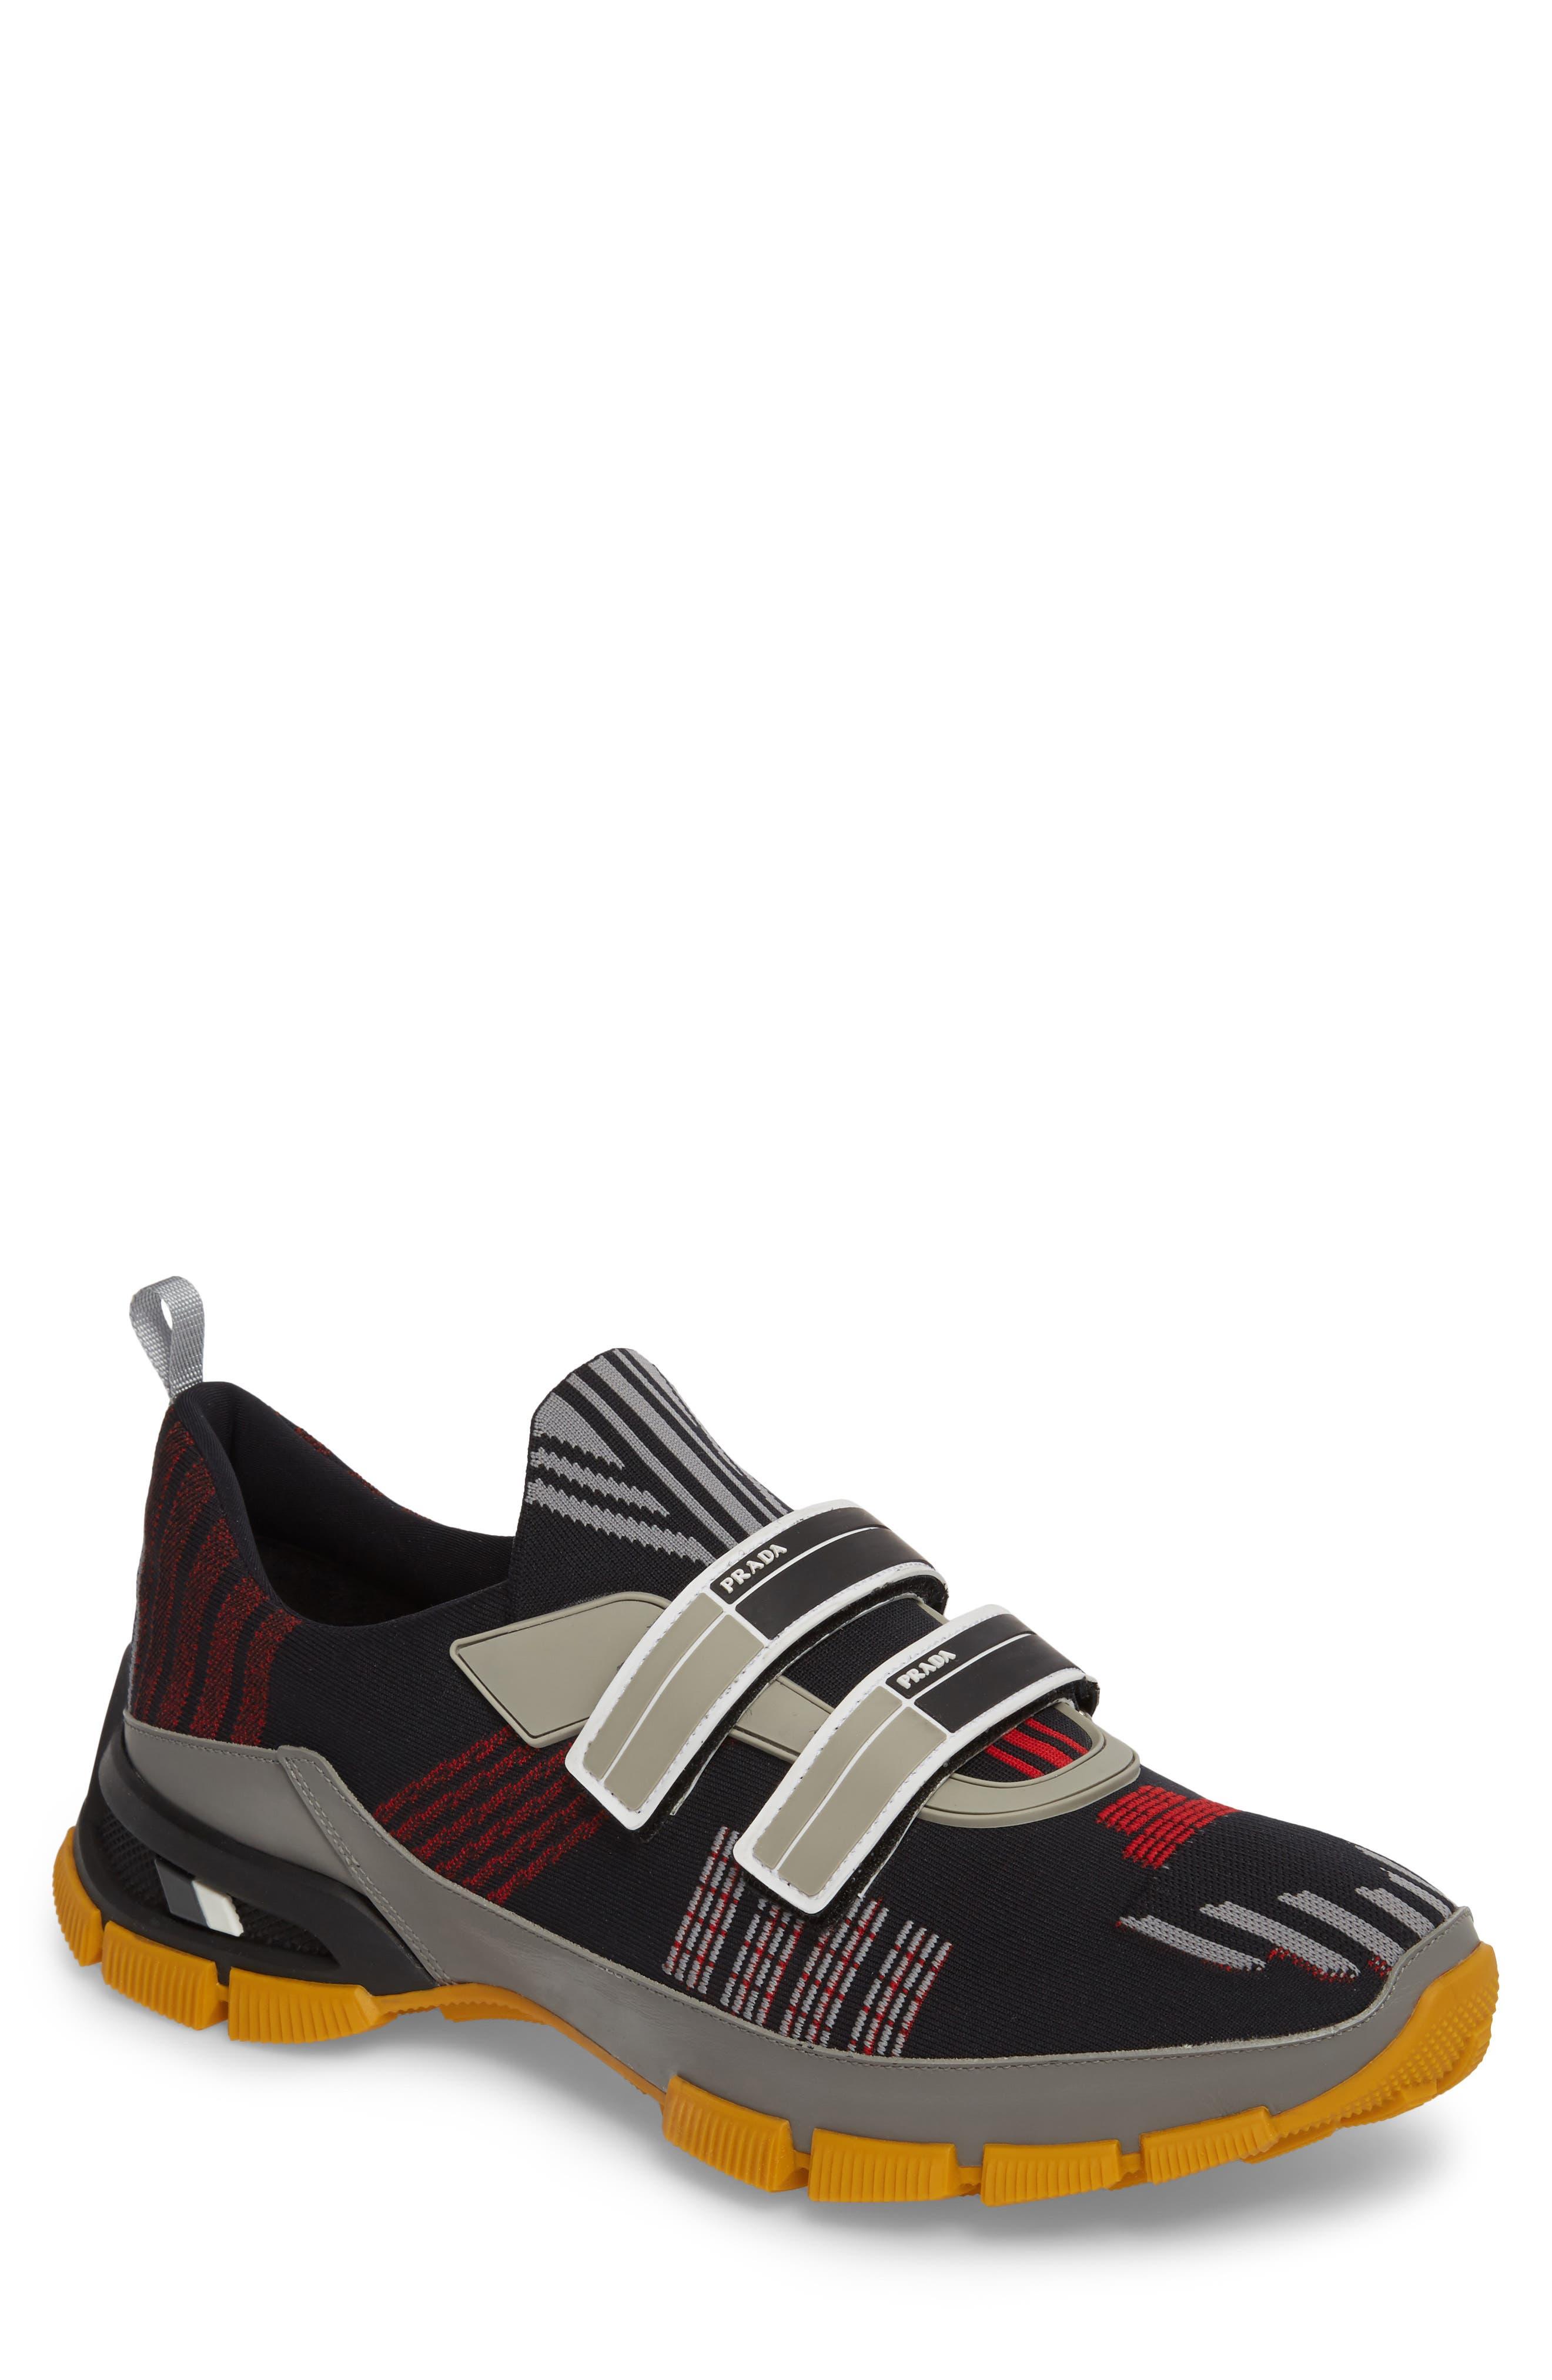 Linea Rossa Strap Sneaker,                             Main thumbnail 1, color,